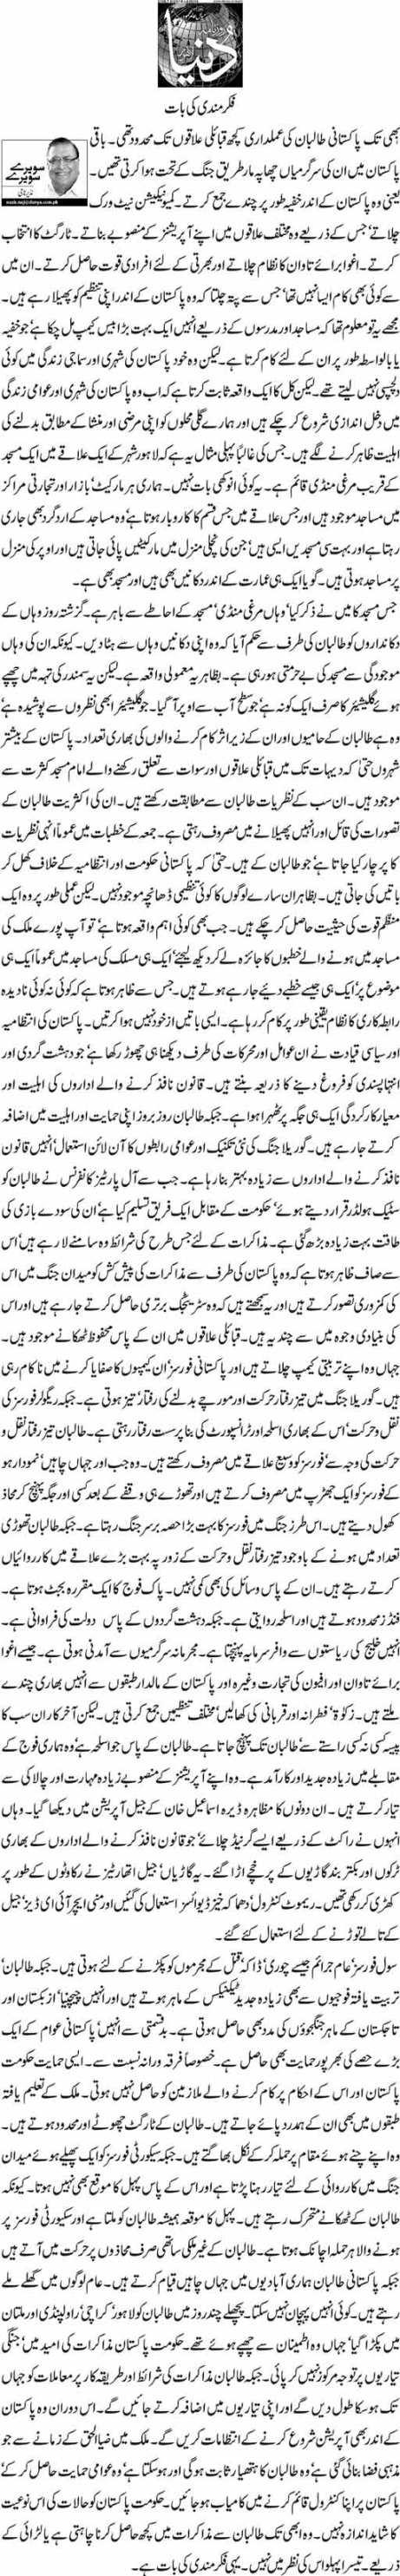 Fikar Mandi Ki Baat - Nazeer Naji